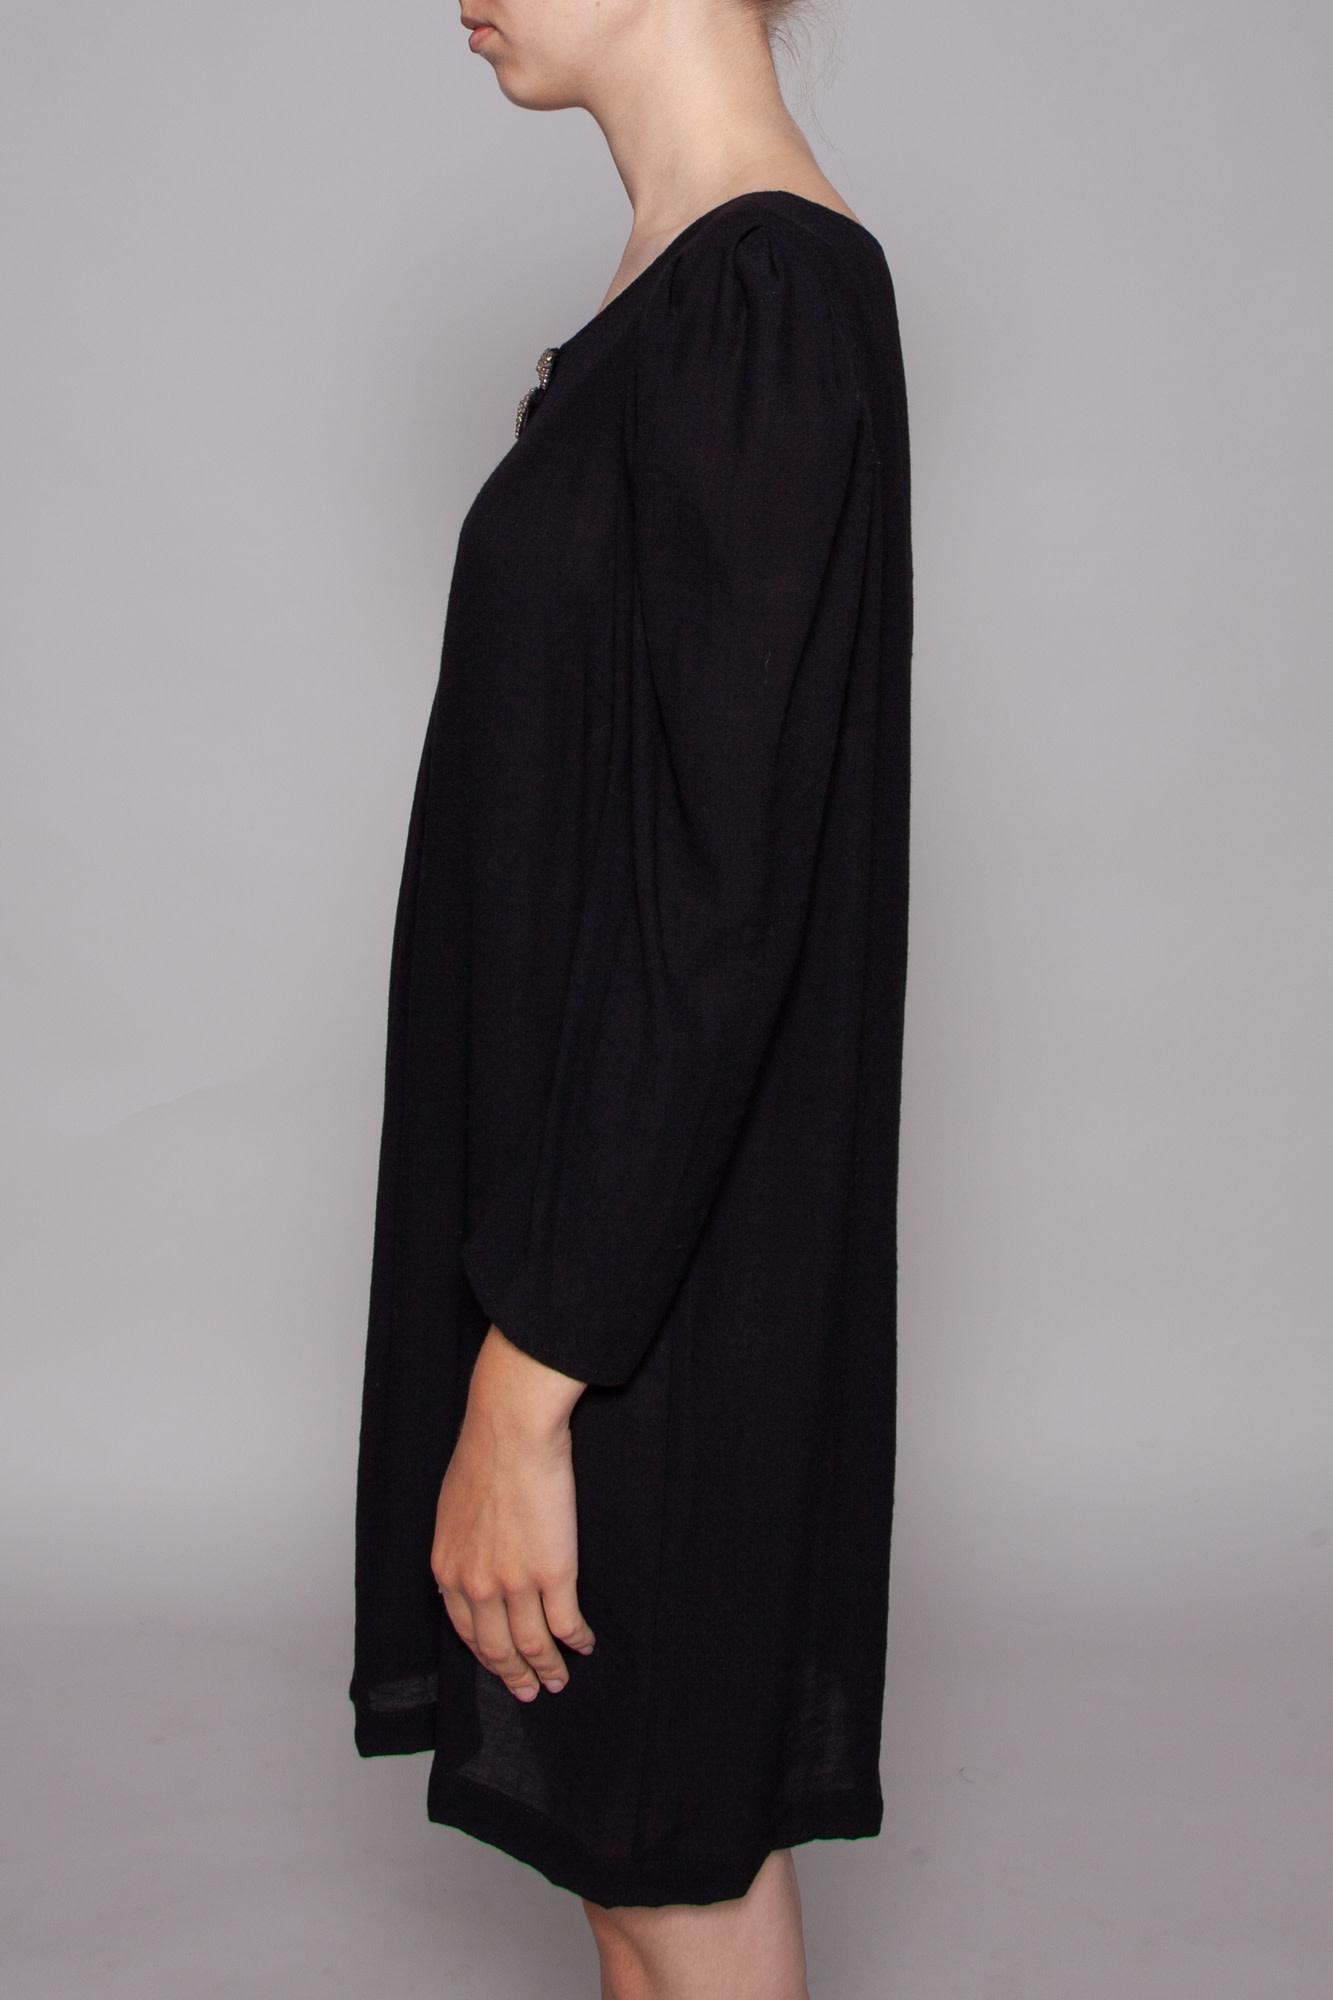 Sandro BLACK DRESS WITH RHINESTONE BOW